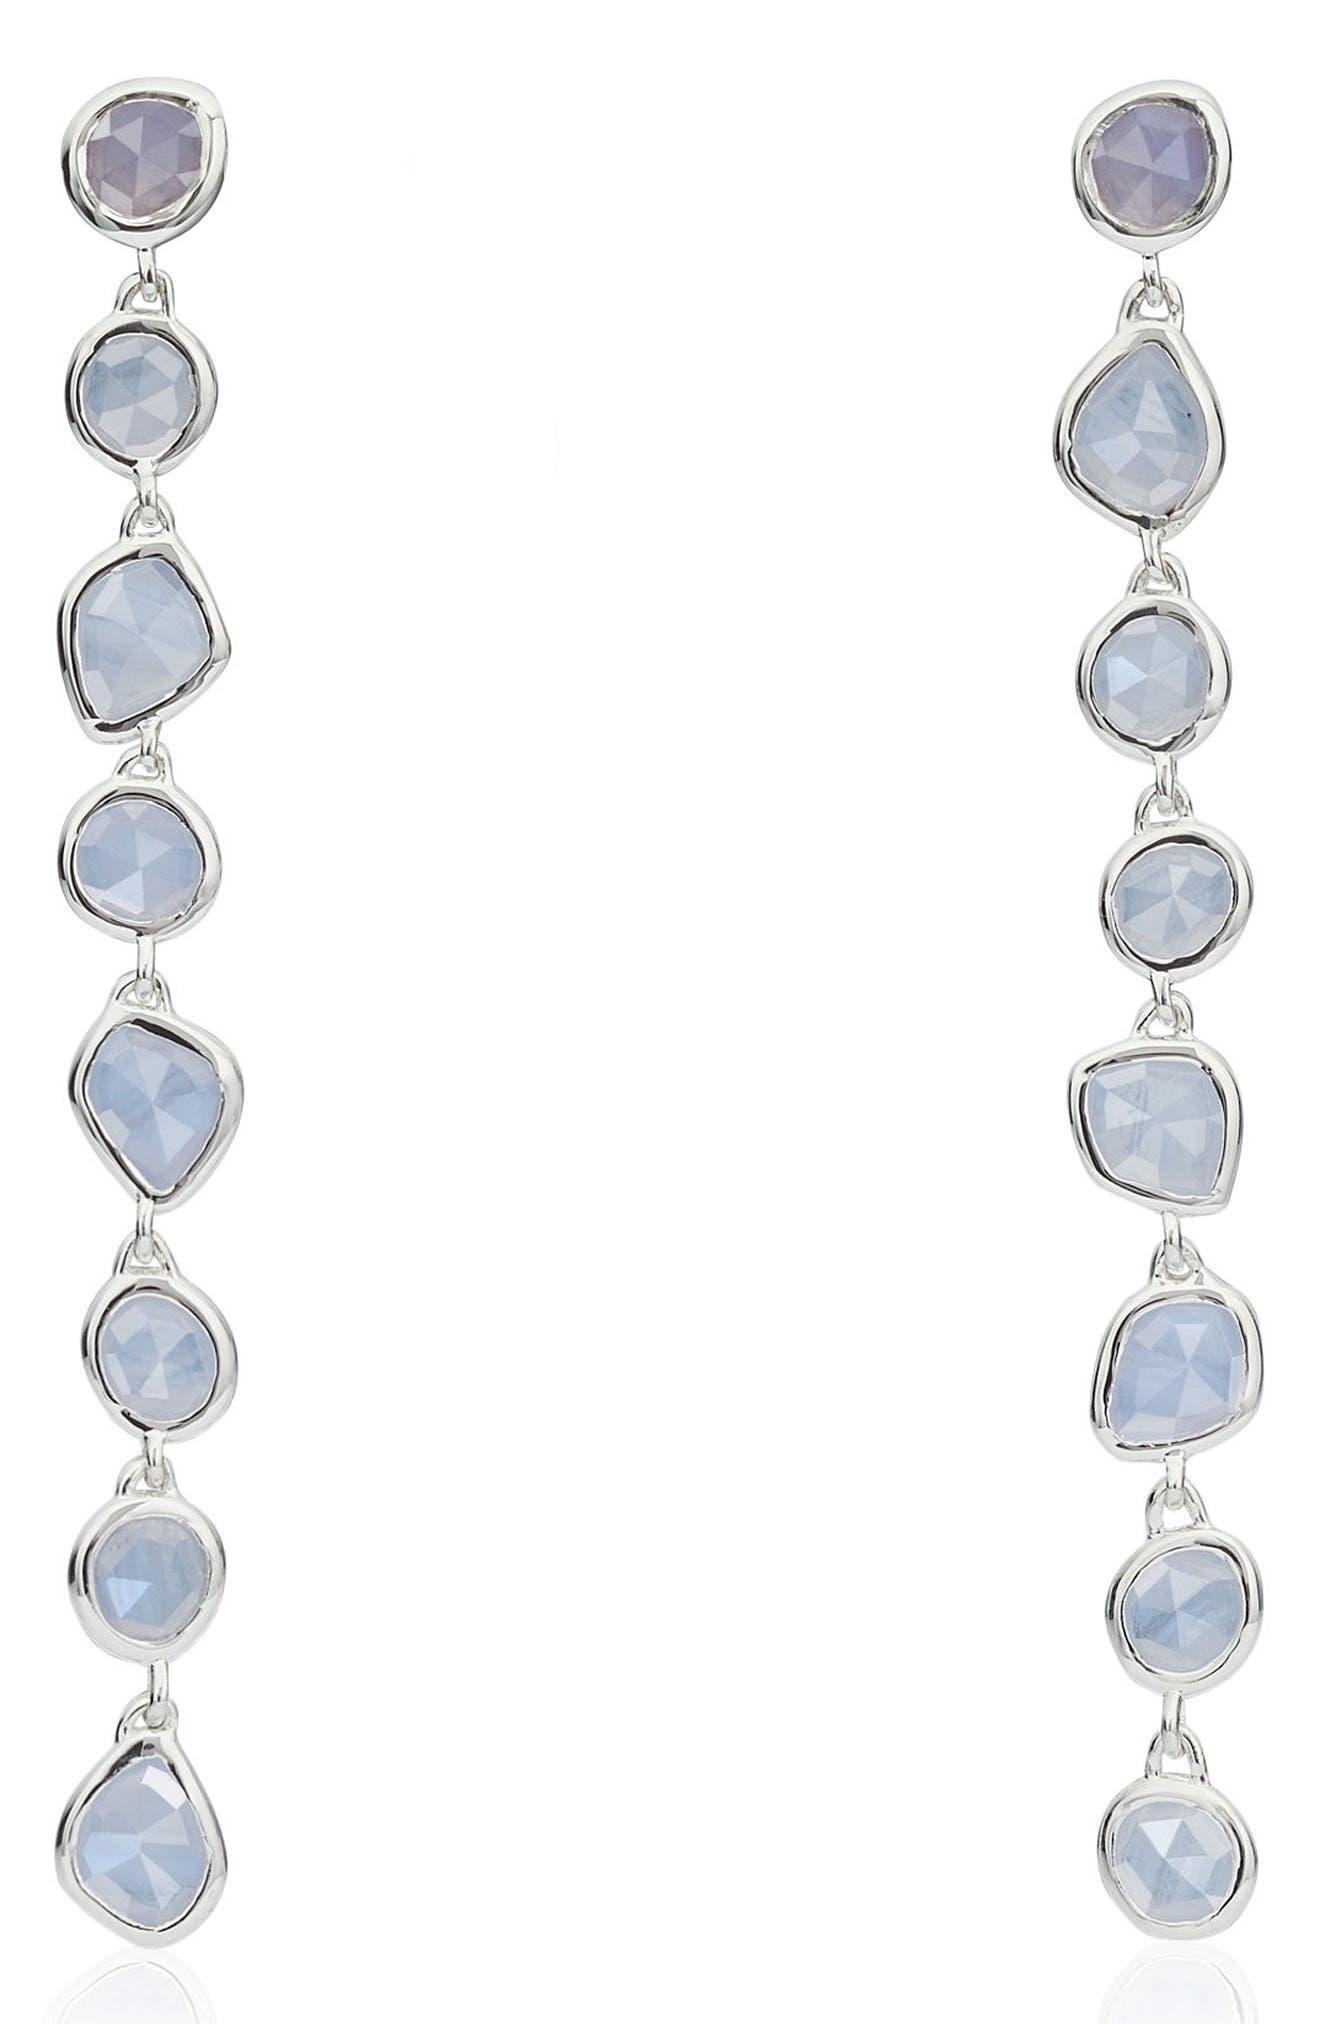 Alternate Image 1 Selected - Monica Vinader Siren Mini Nugget Earrings